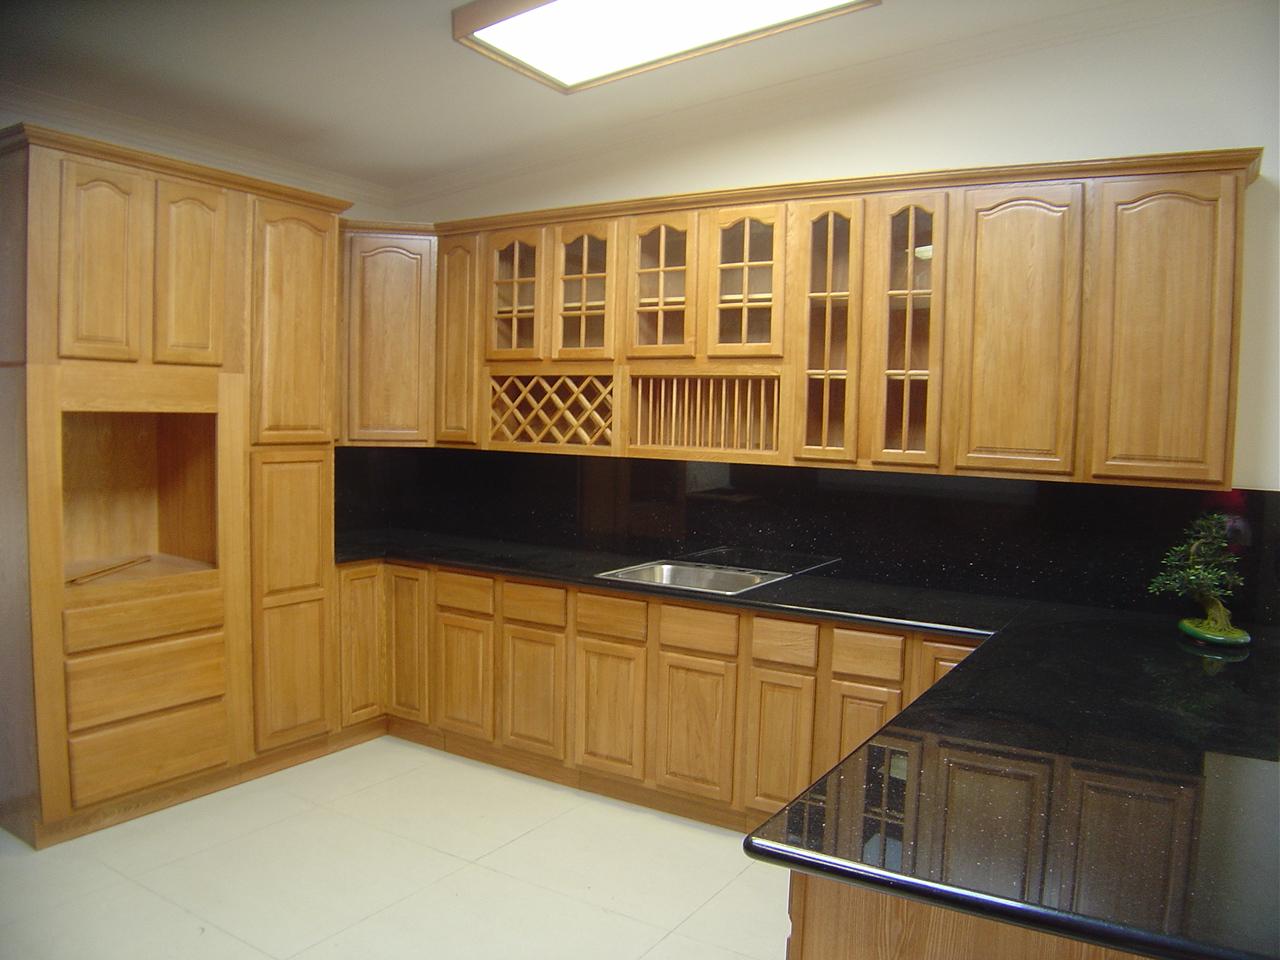 http://1.bp.blogspot.com/-abNBORAjsRo/T8czcKrRz4I/AAAAAAAABEE/btl-bNf8oMg/s1600/kitchen%20cabinet%203.jpg